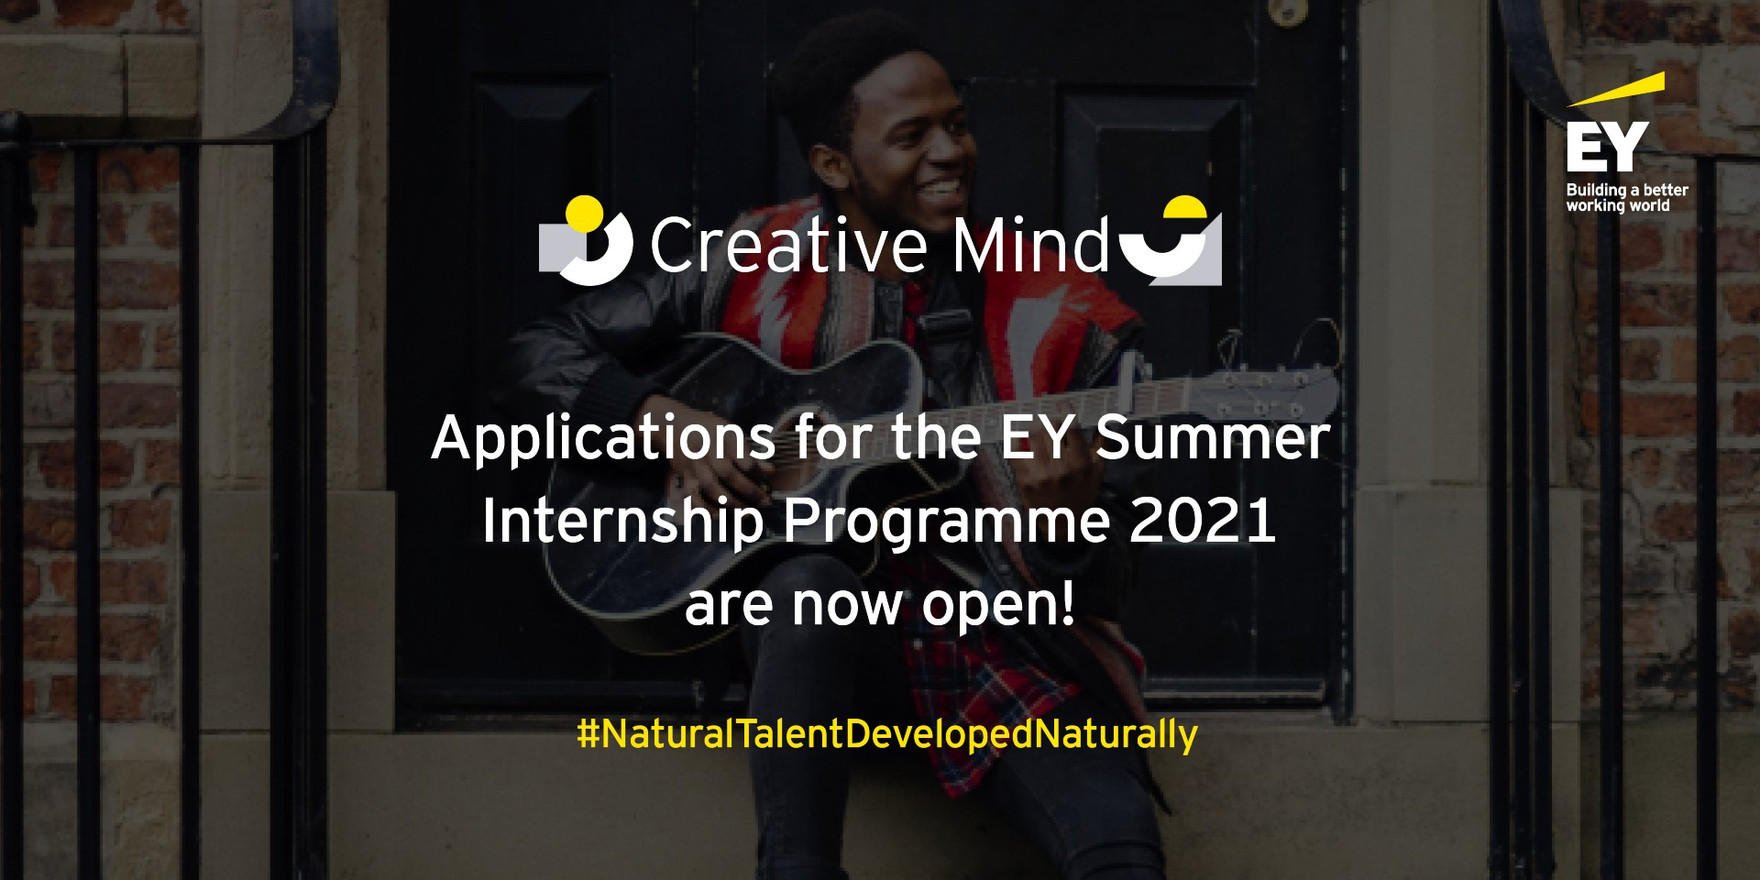 EY Summer Internship 2021